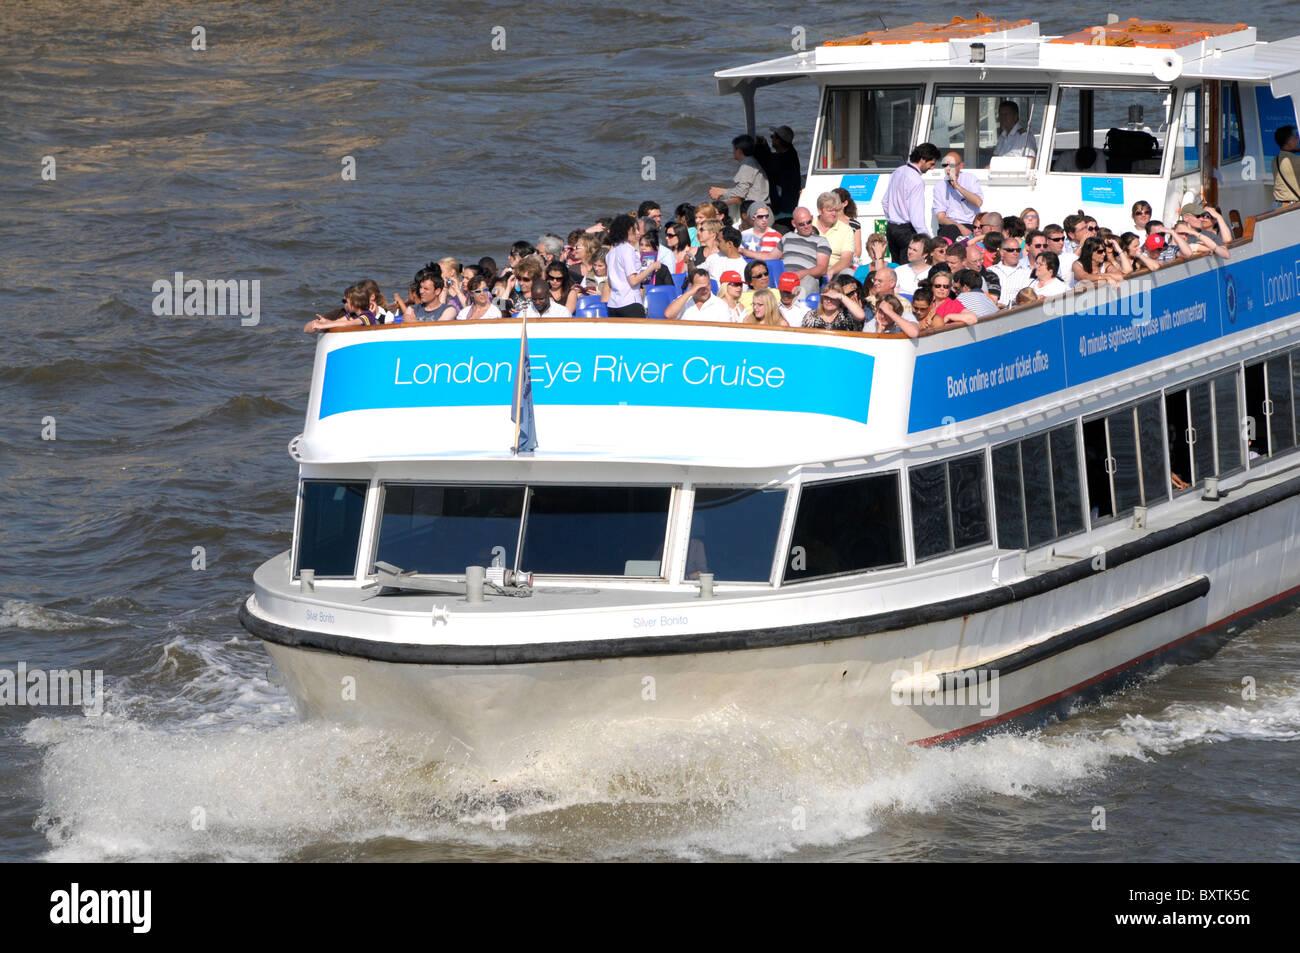 Pleasure Boat On The River Thames London Eye River Cruise